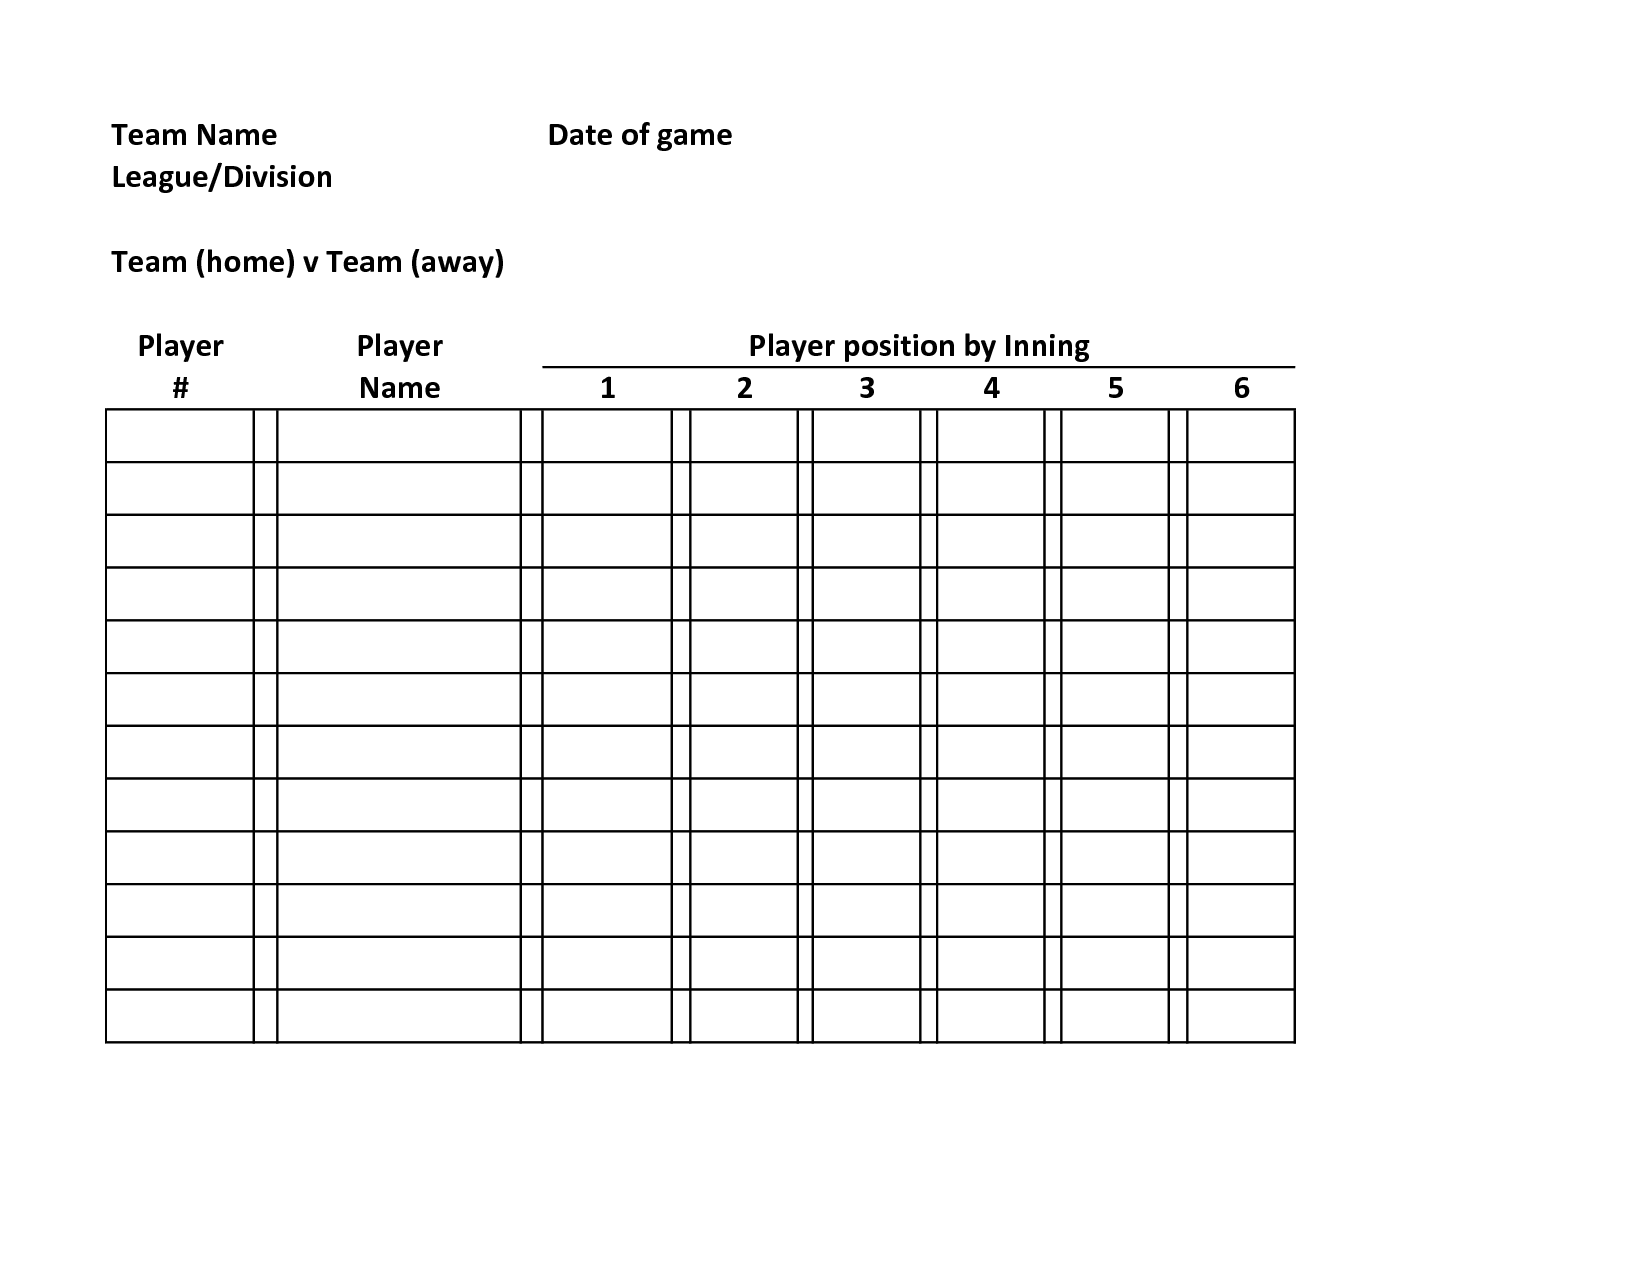 New Youth Baseball Lineup Template Exceltemplate Xls Xlstemplate Xlsformat Excelformat Microsoftexcel Baseball Lineup Baseball Card Template Team Names